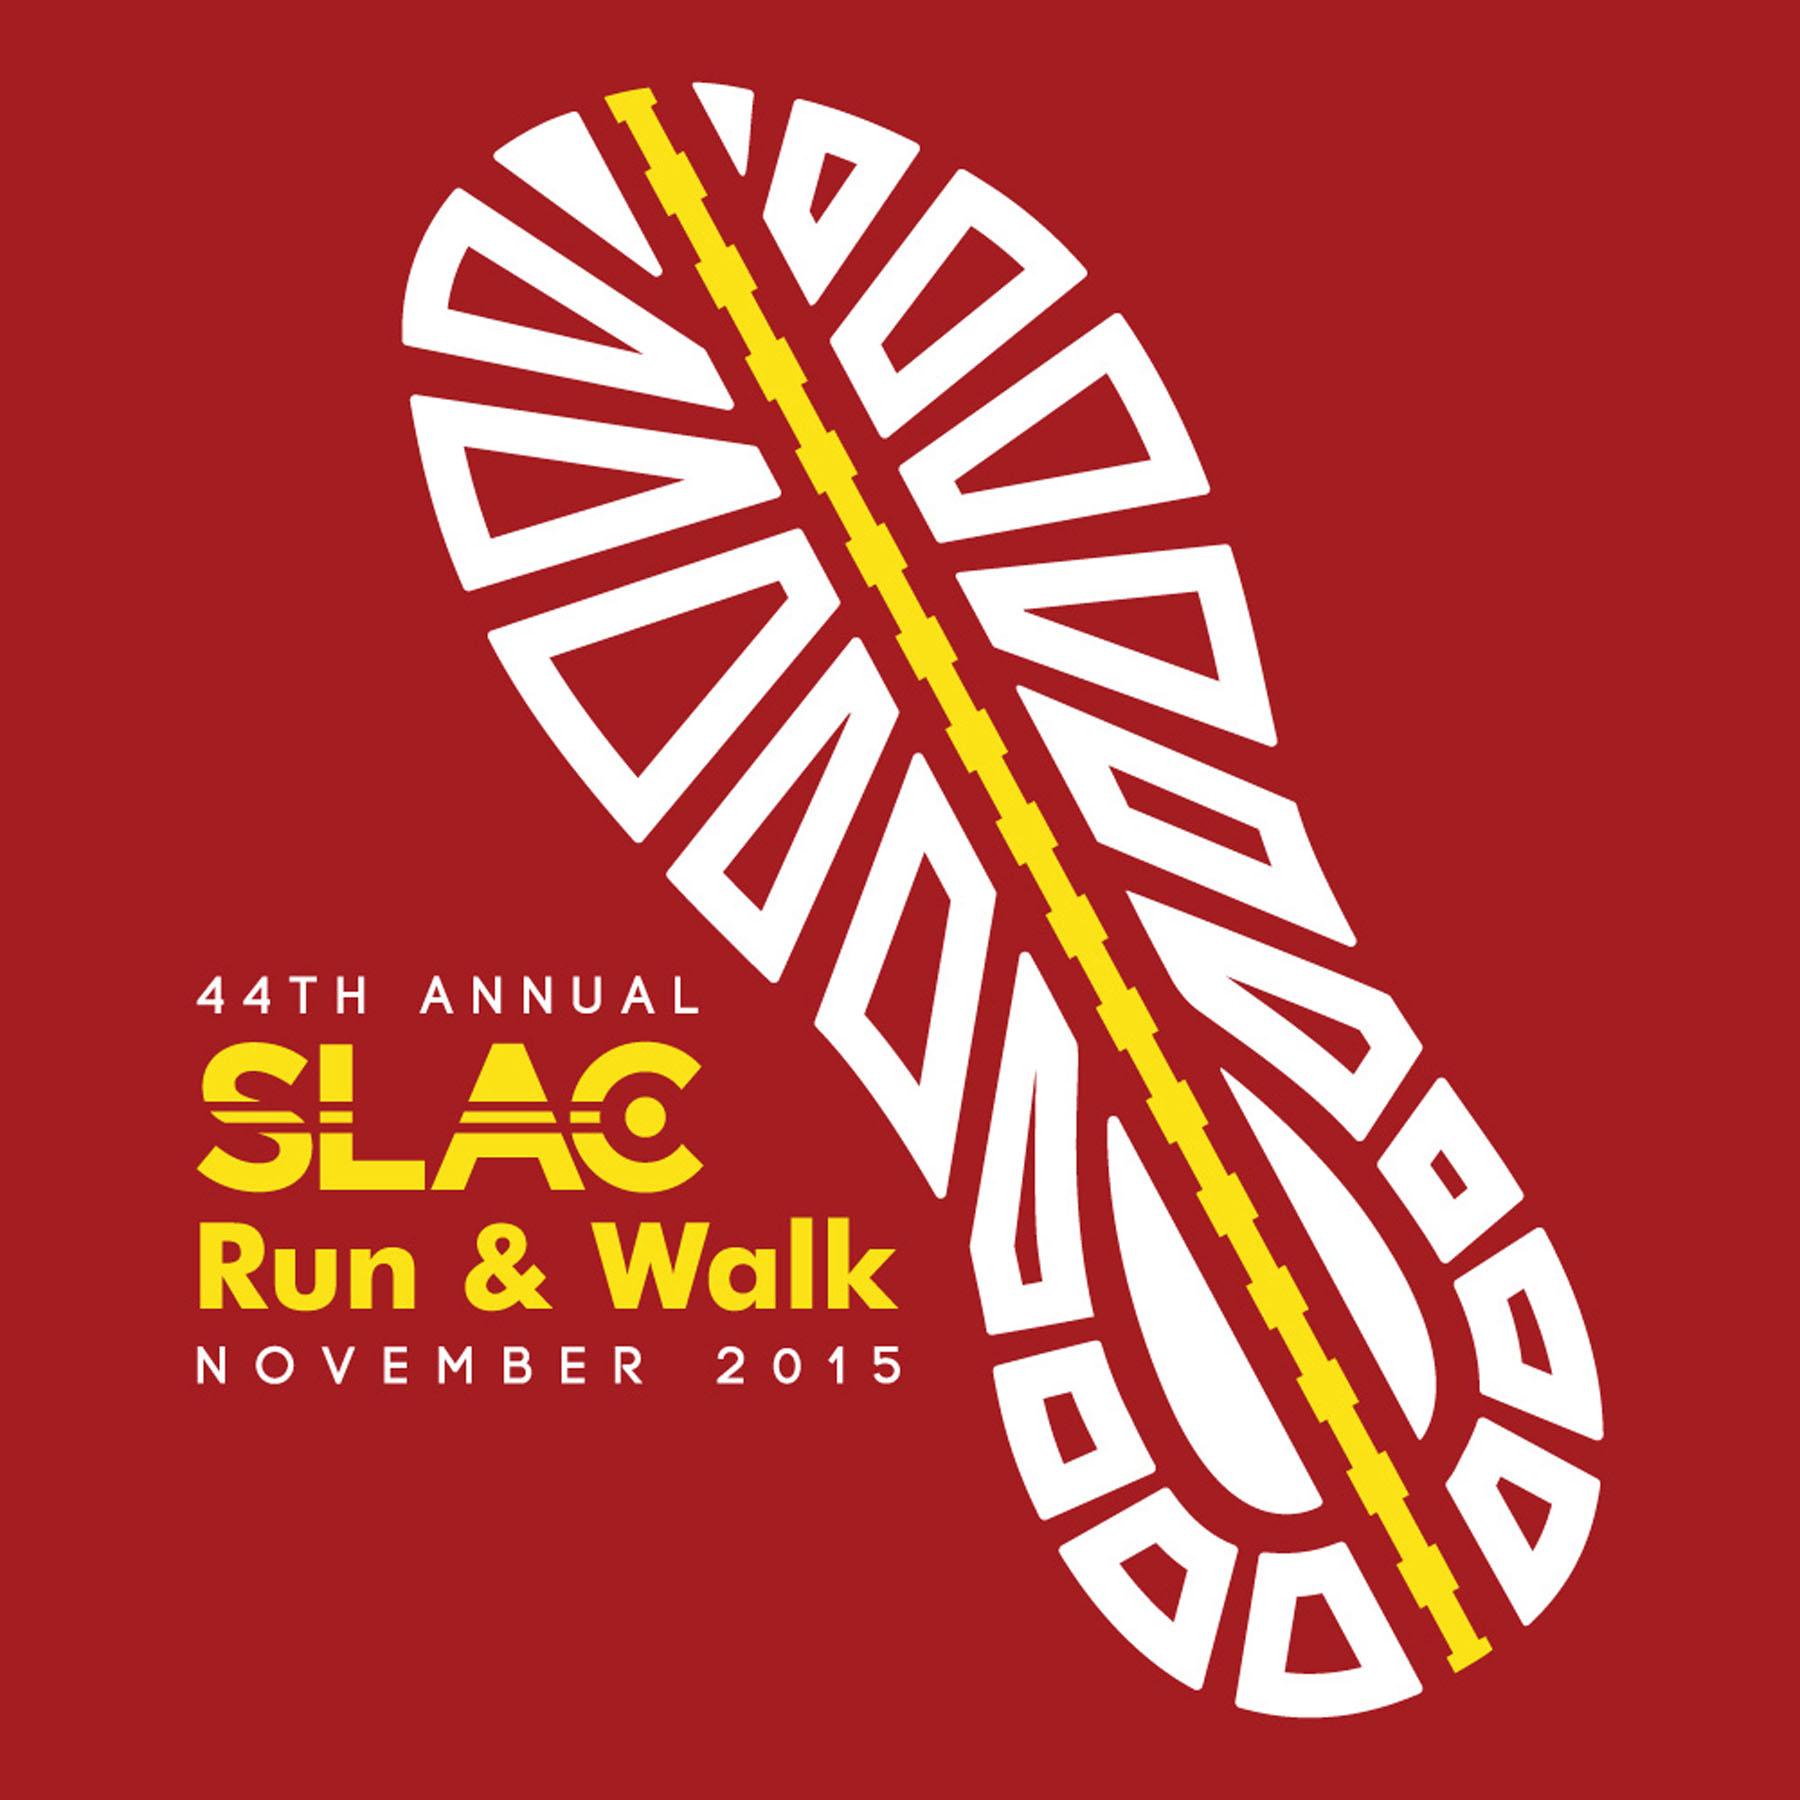 SLAC Run/Walk Event Branding